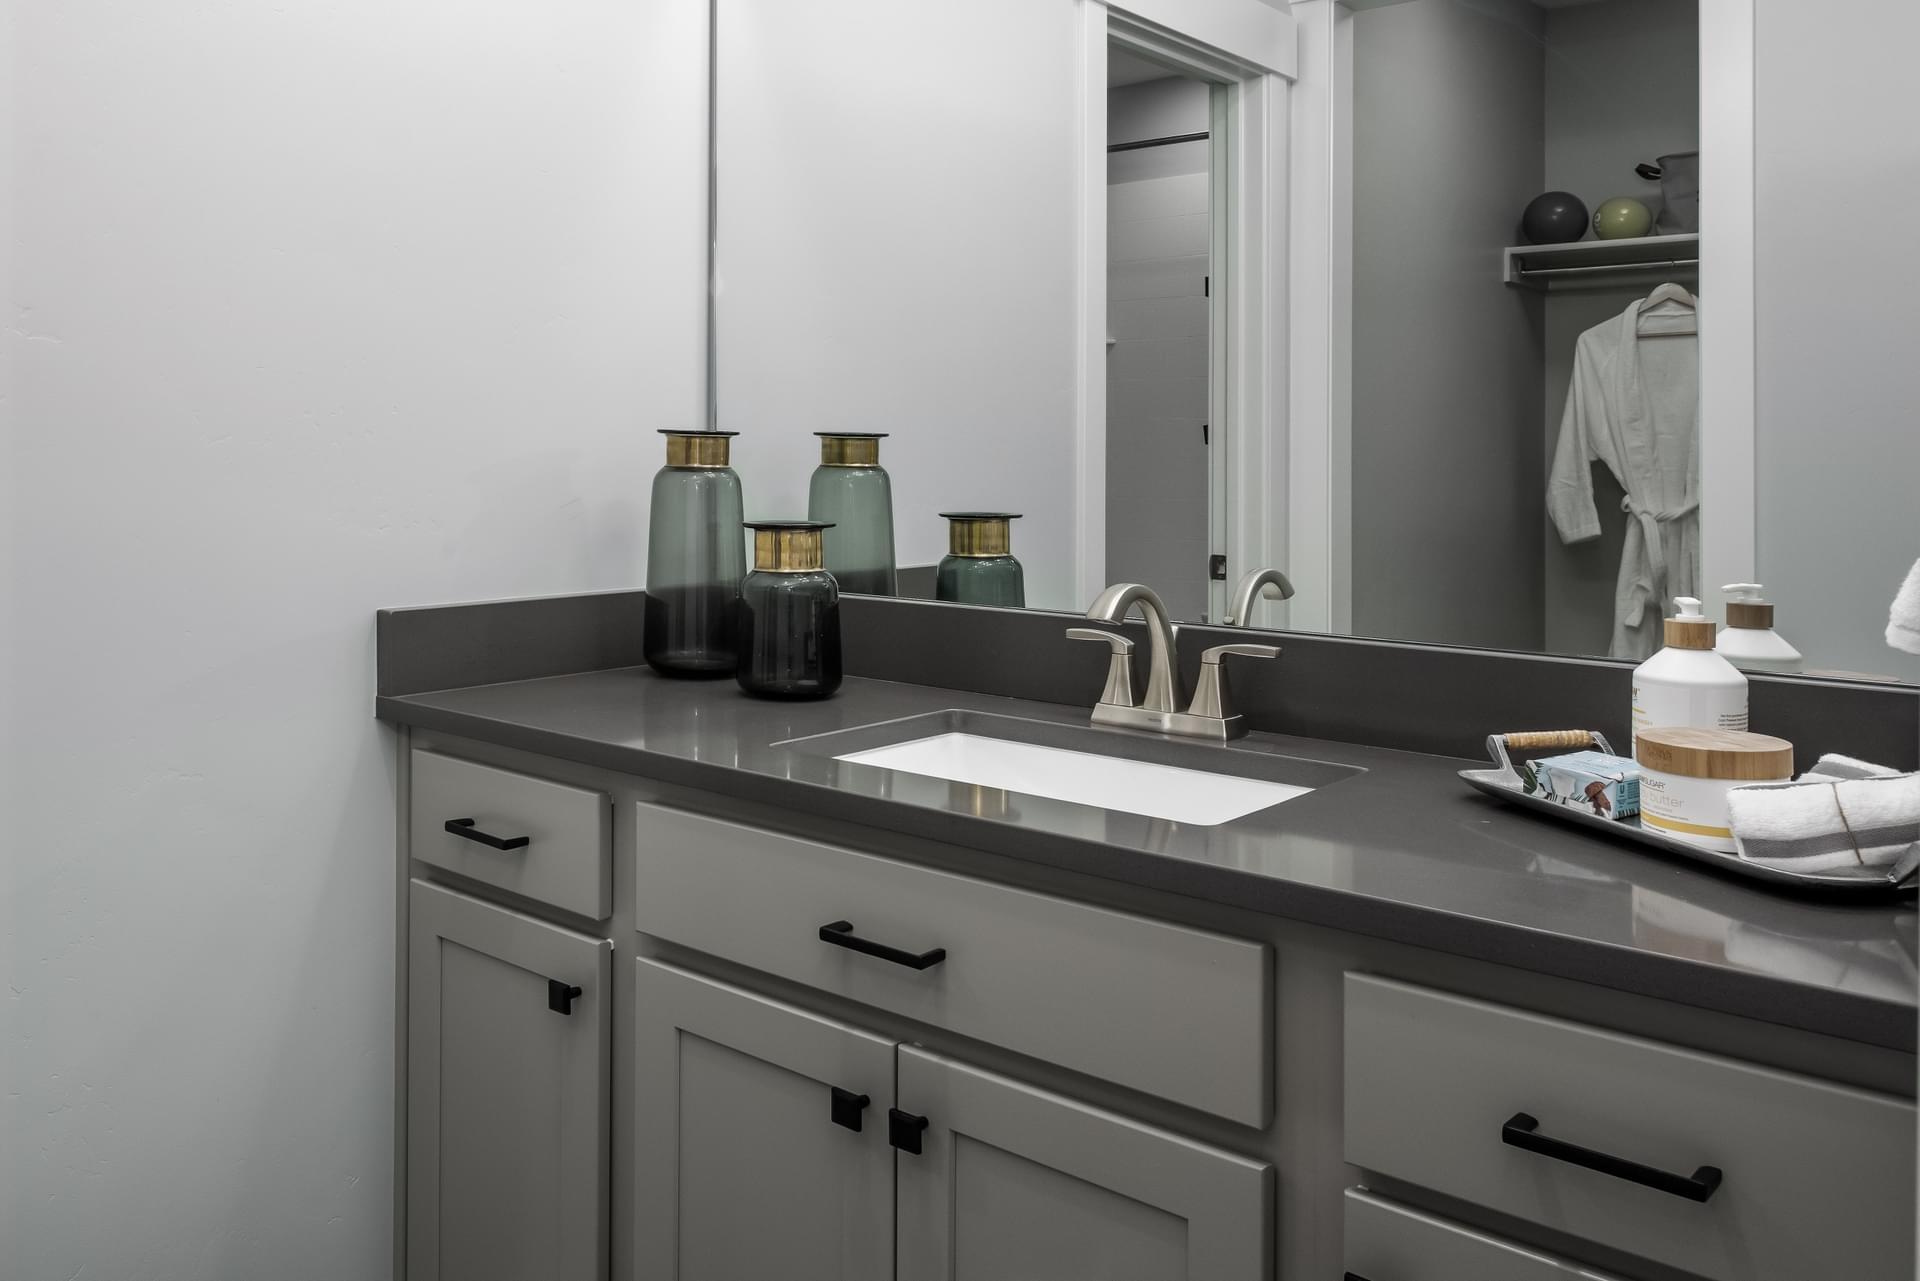 New Home Bathrooms Photos of Fieldstone Homes